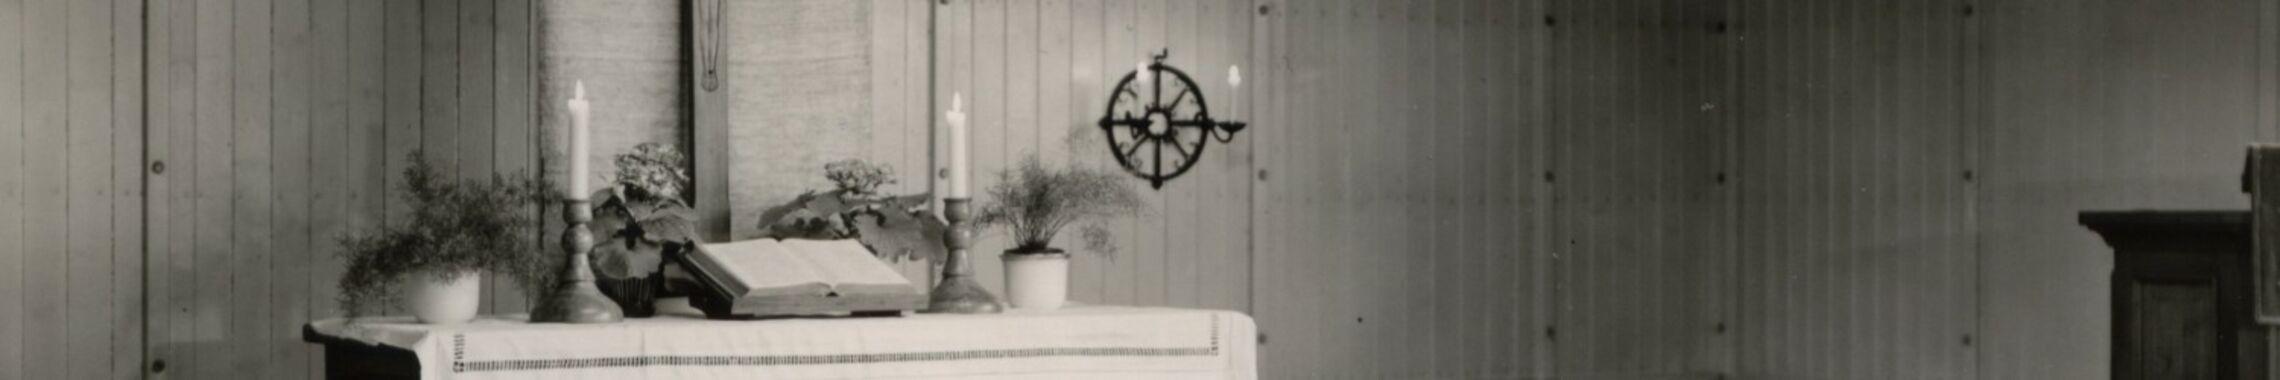 kopf_archiv_altar_1920-250